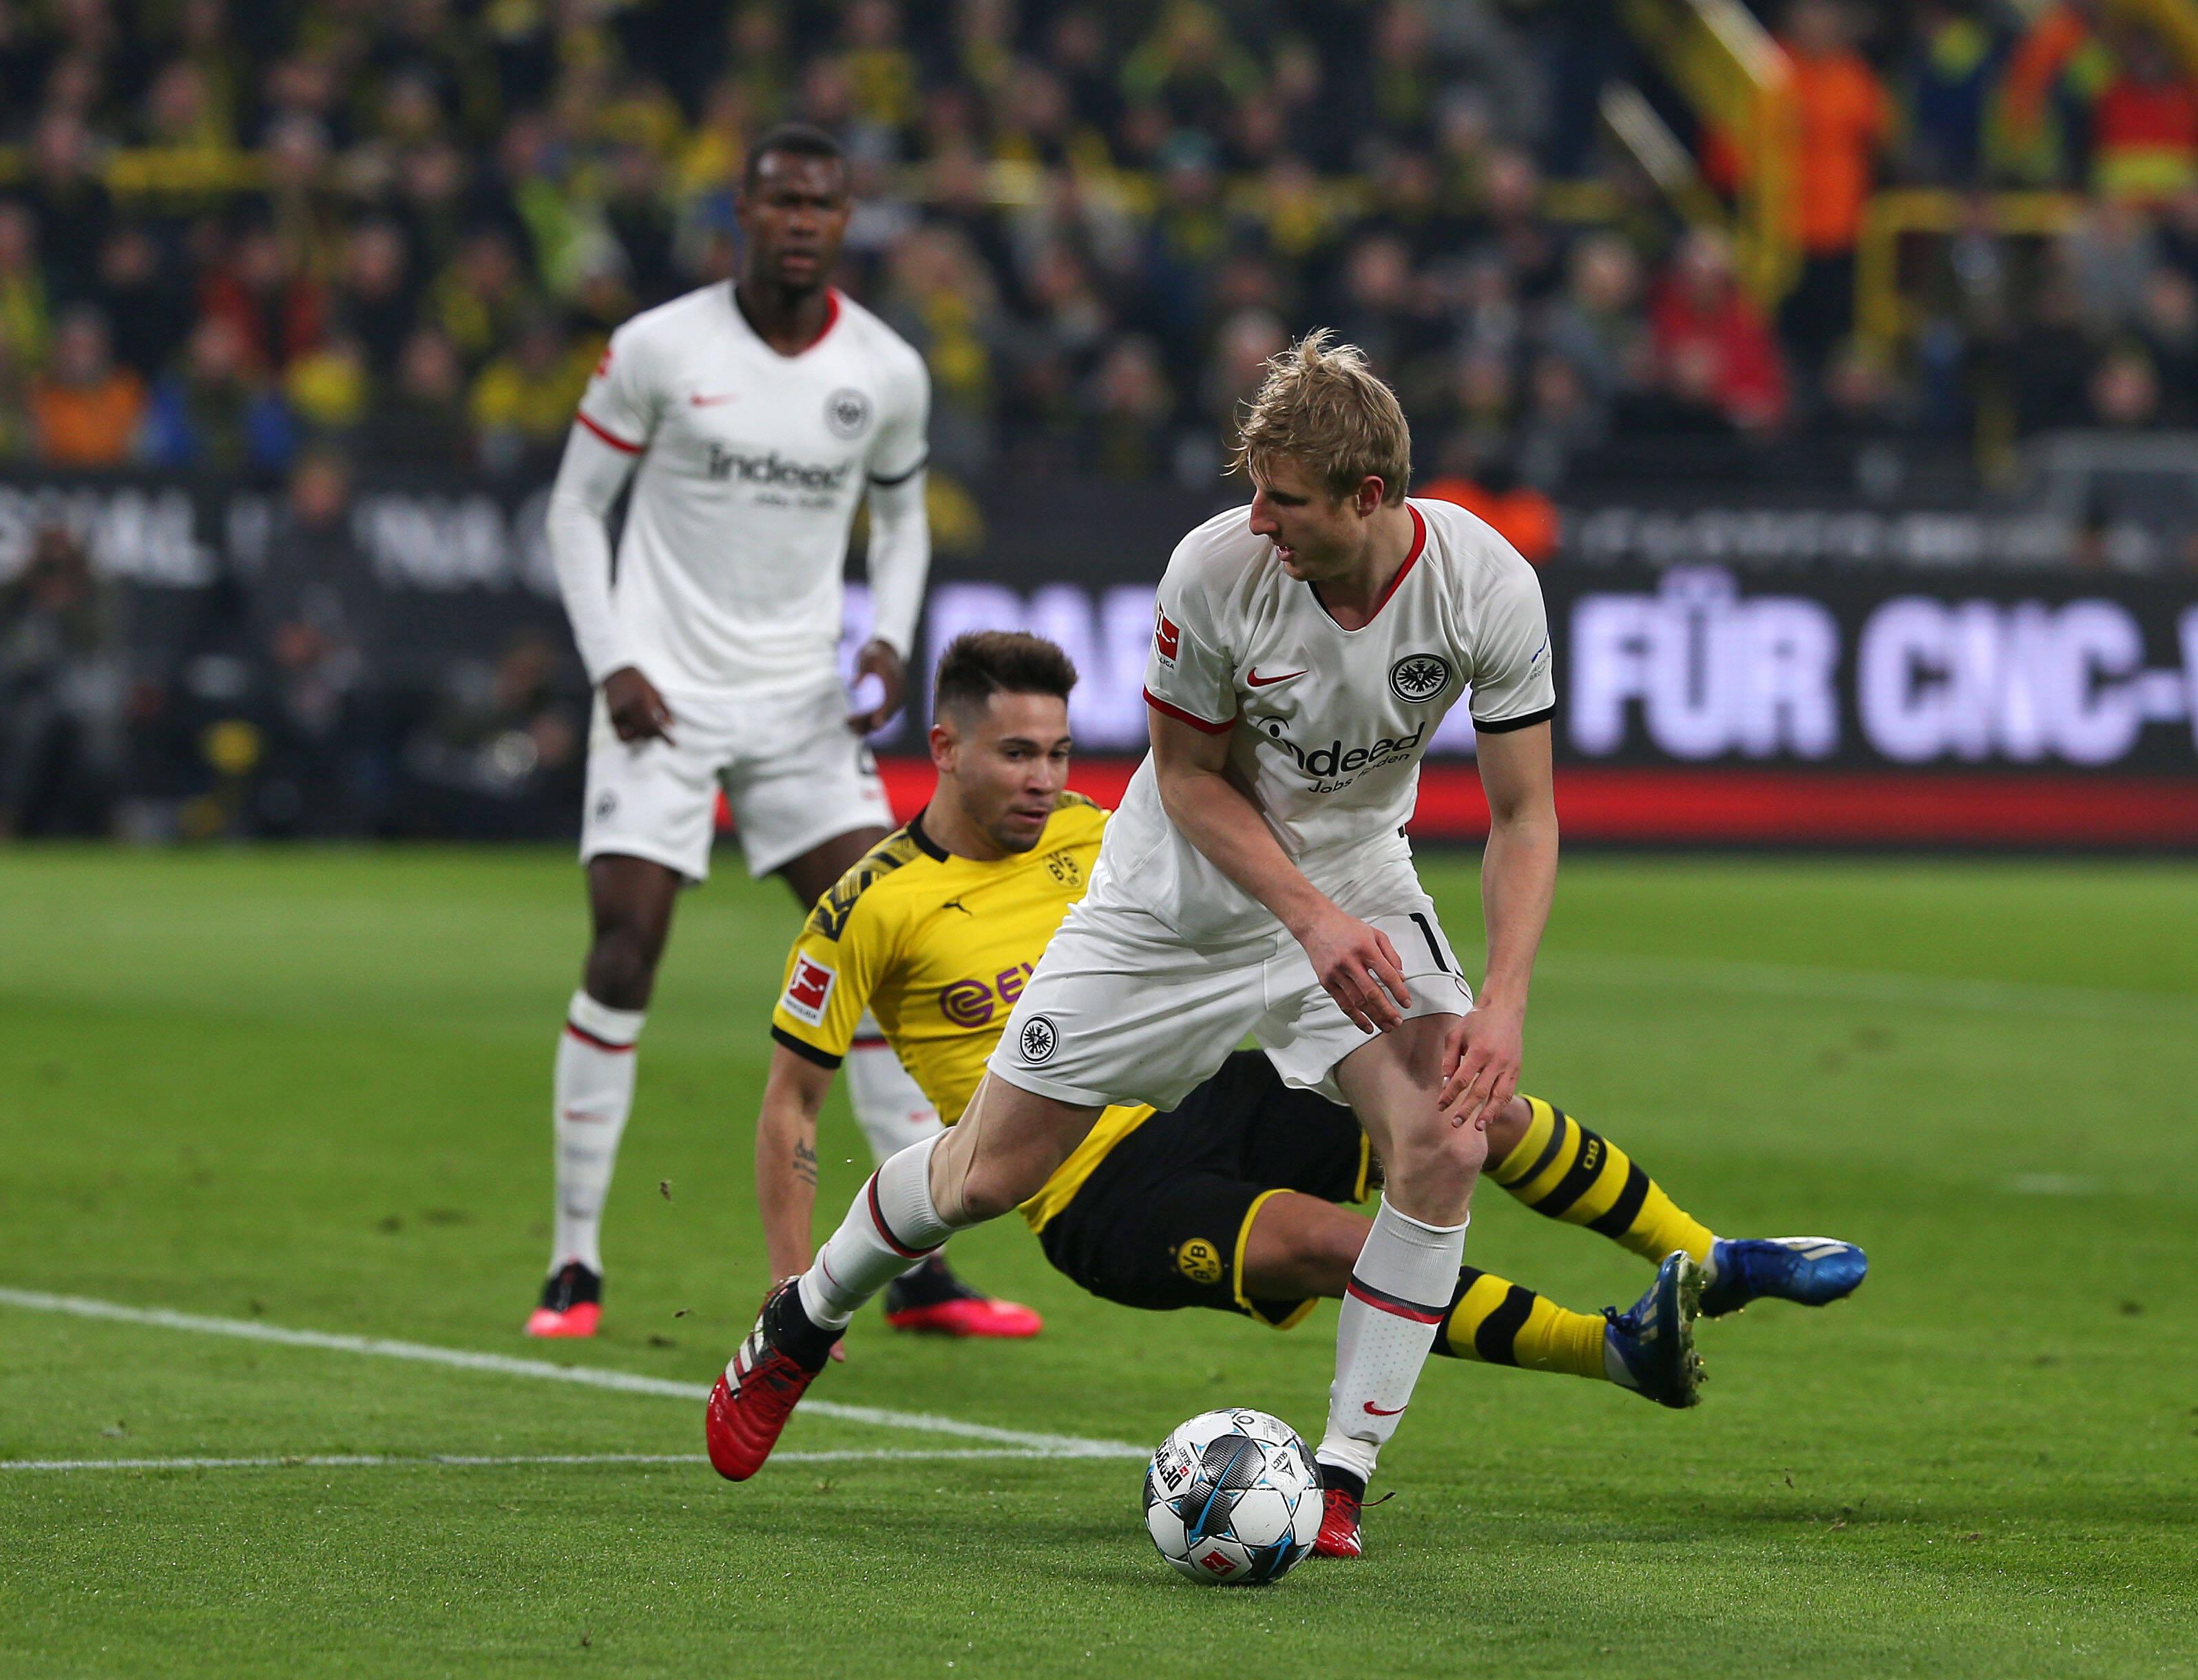 Sge Dortmund